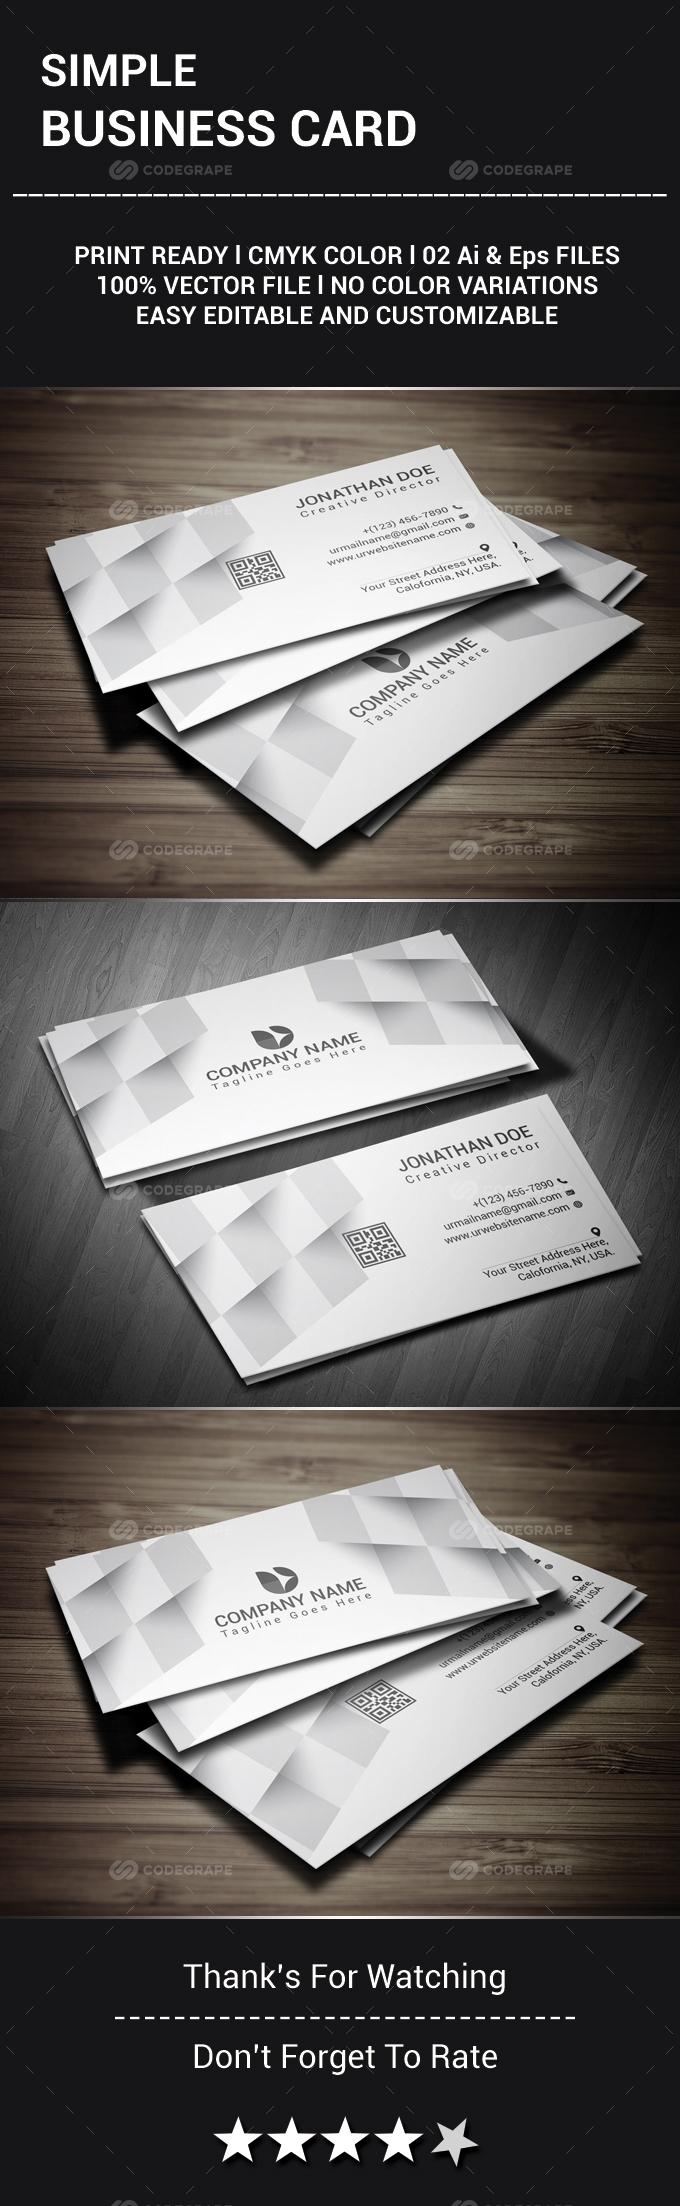 Simple Business Card - Print | CodeGrape